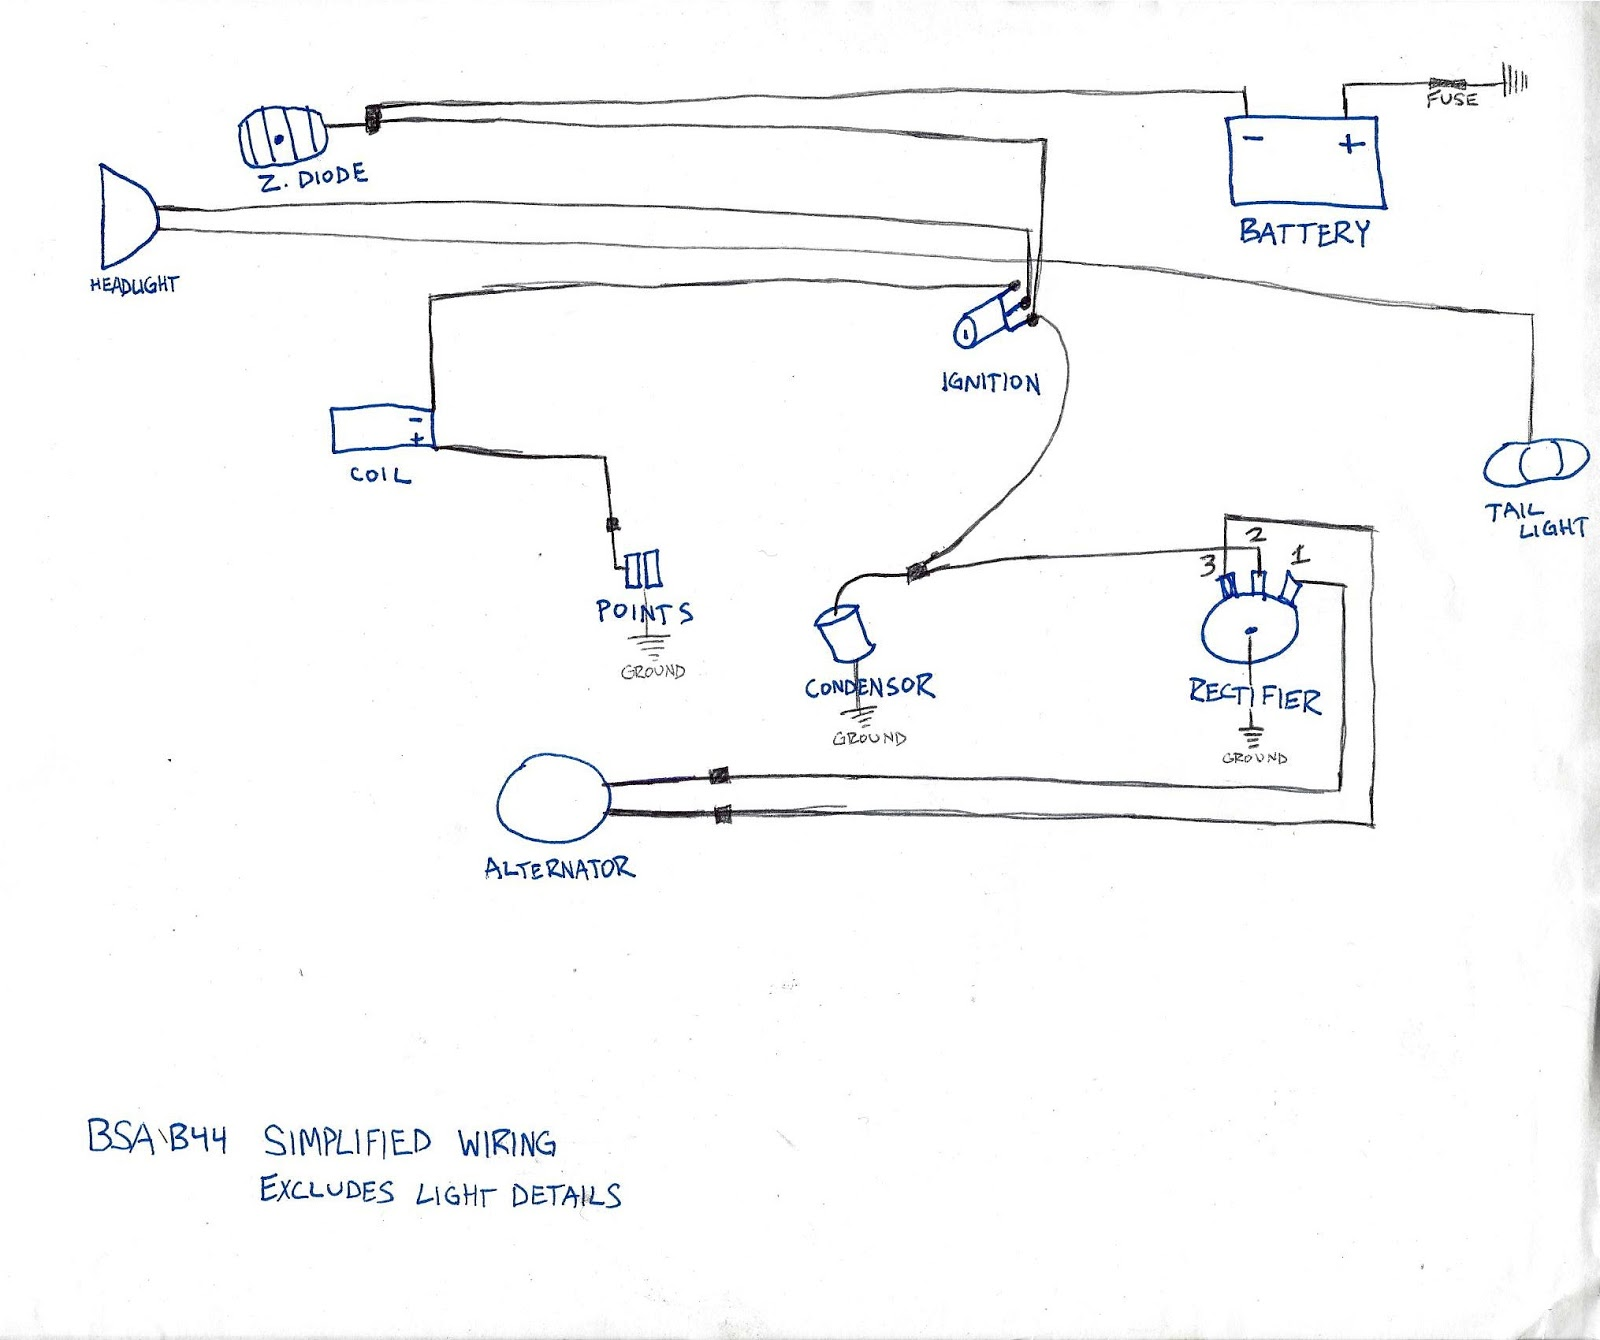 medium resolution of bsa wiring diagrams wiring diagram source two wire alternator wiring diagram 1968 bsa wiring diagram